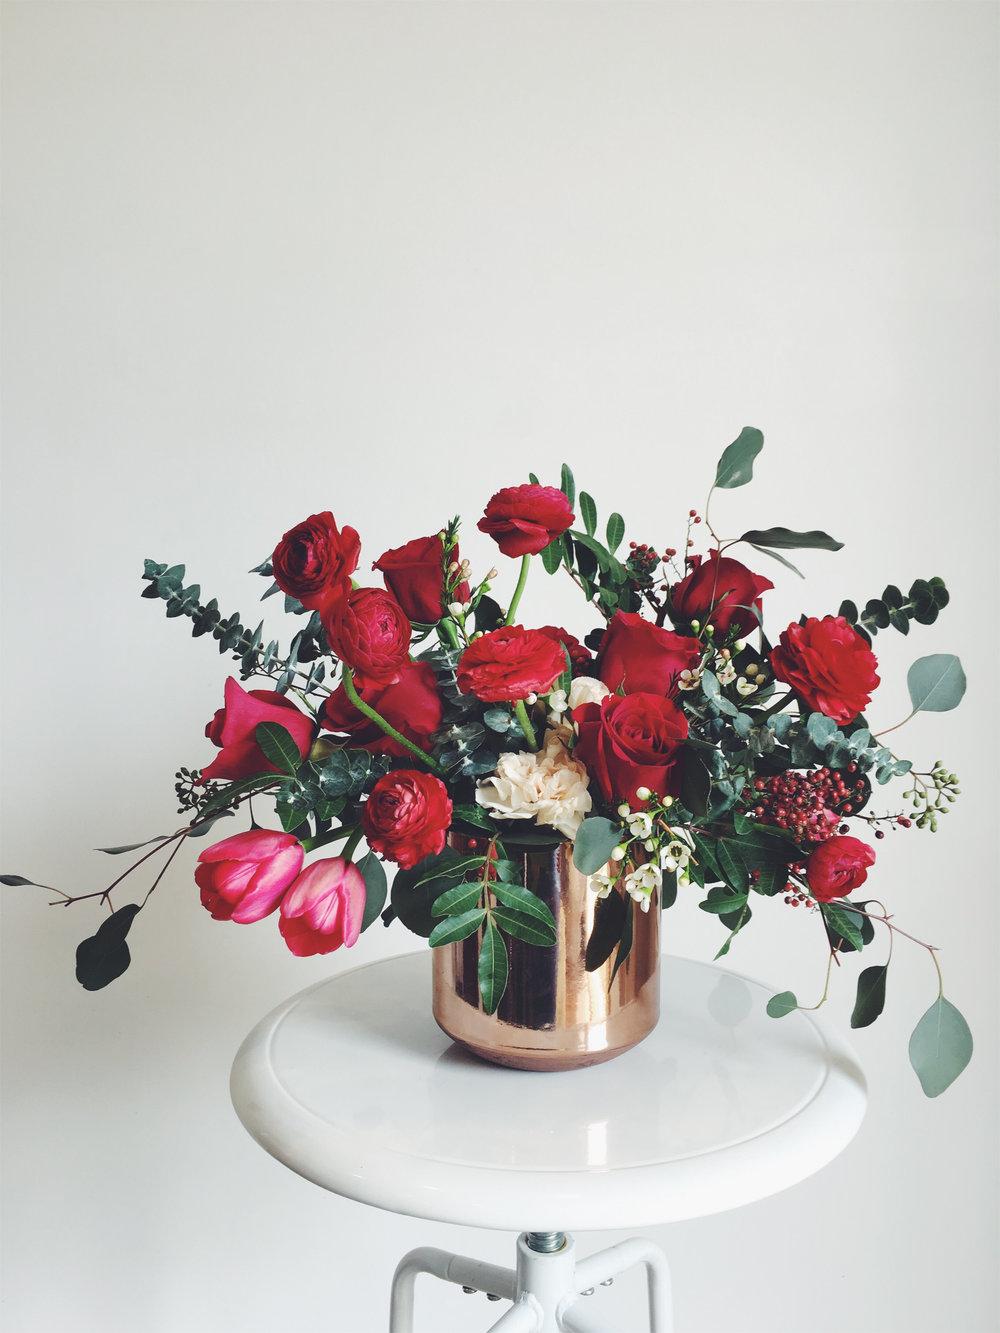 Valentine's Day flowers in copper vase